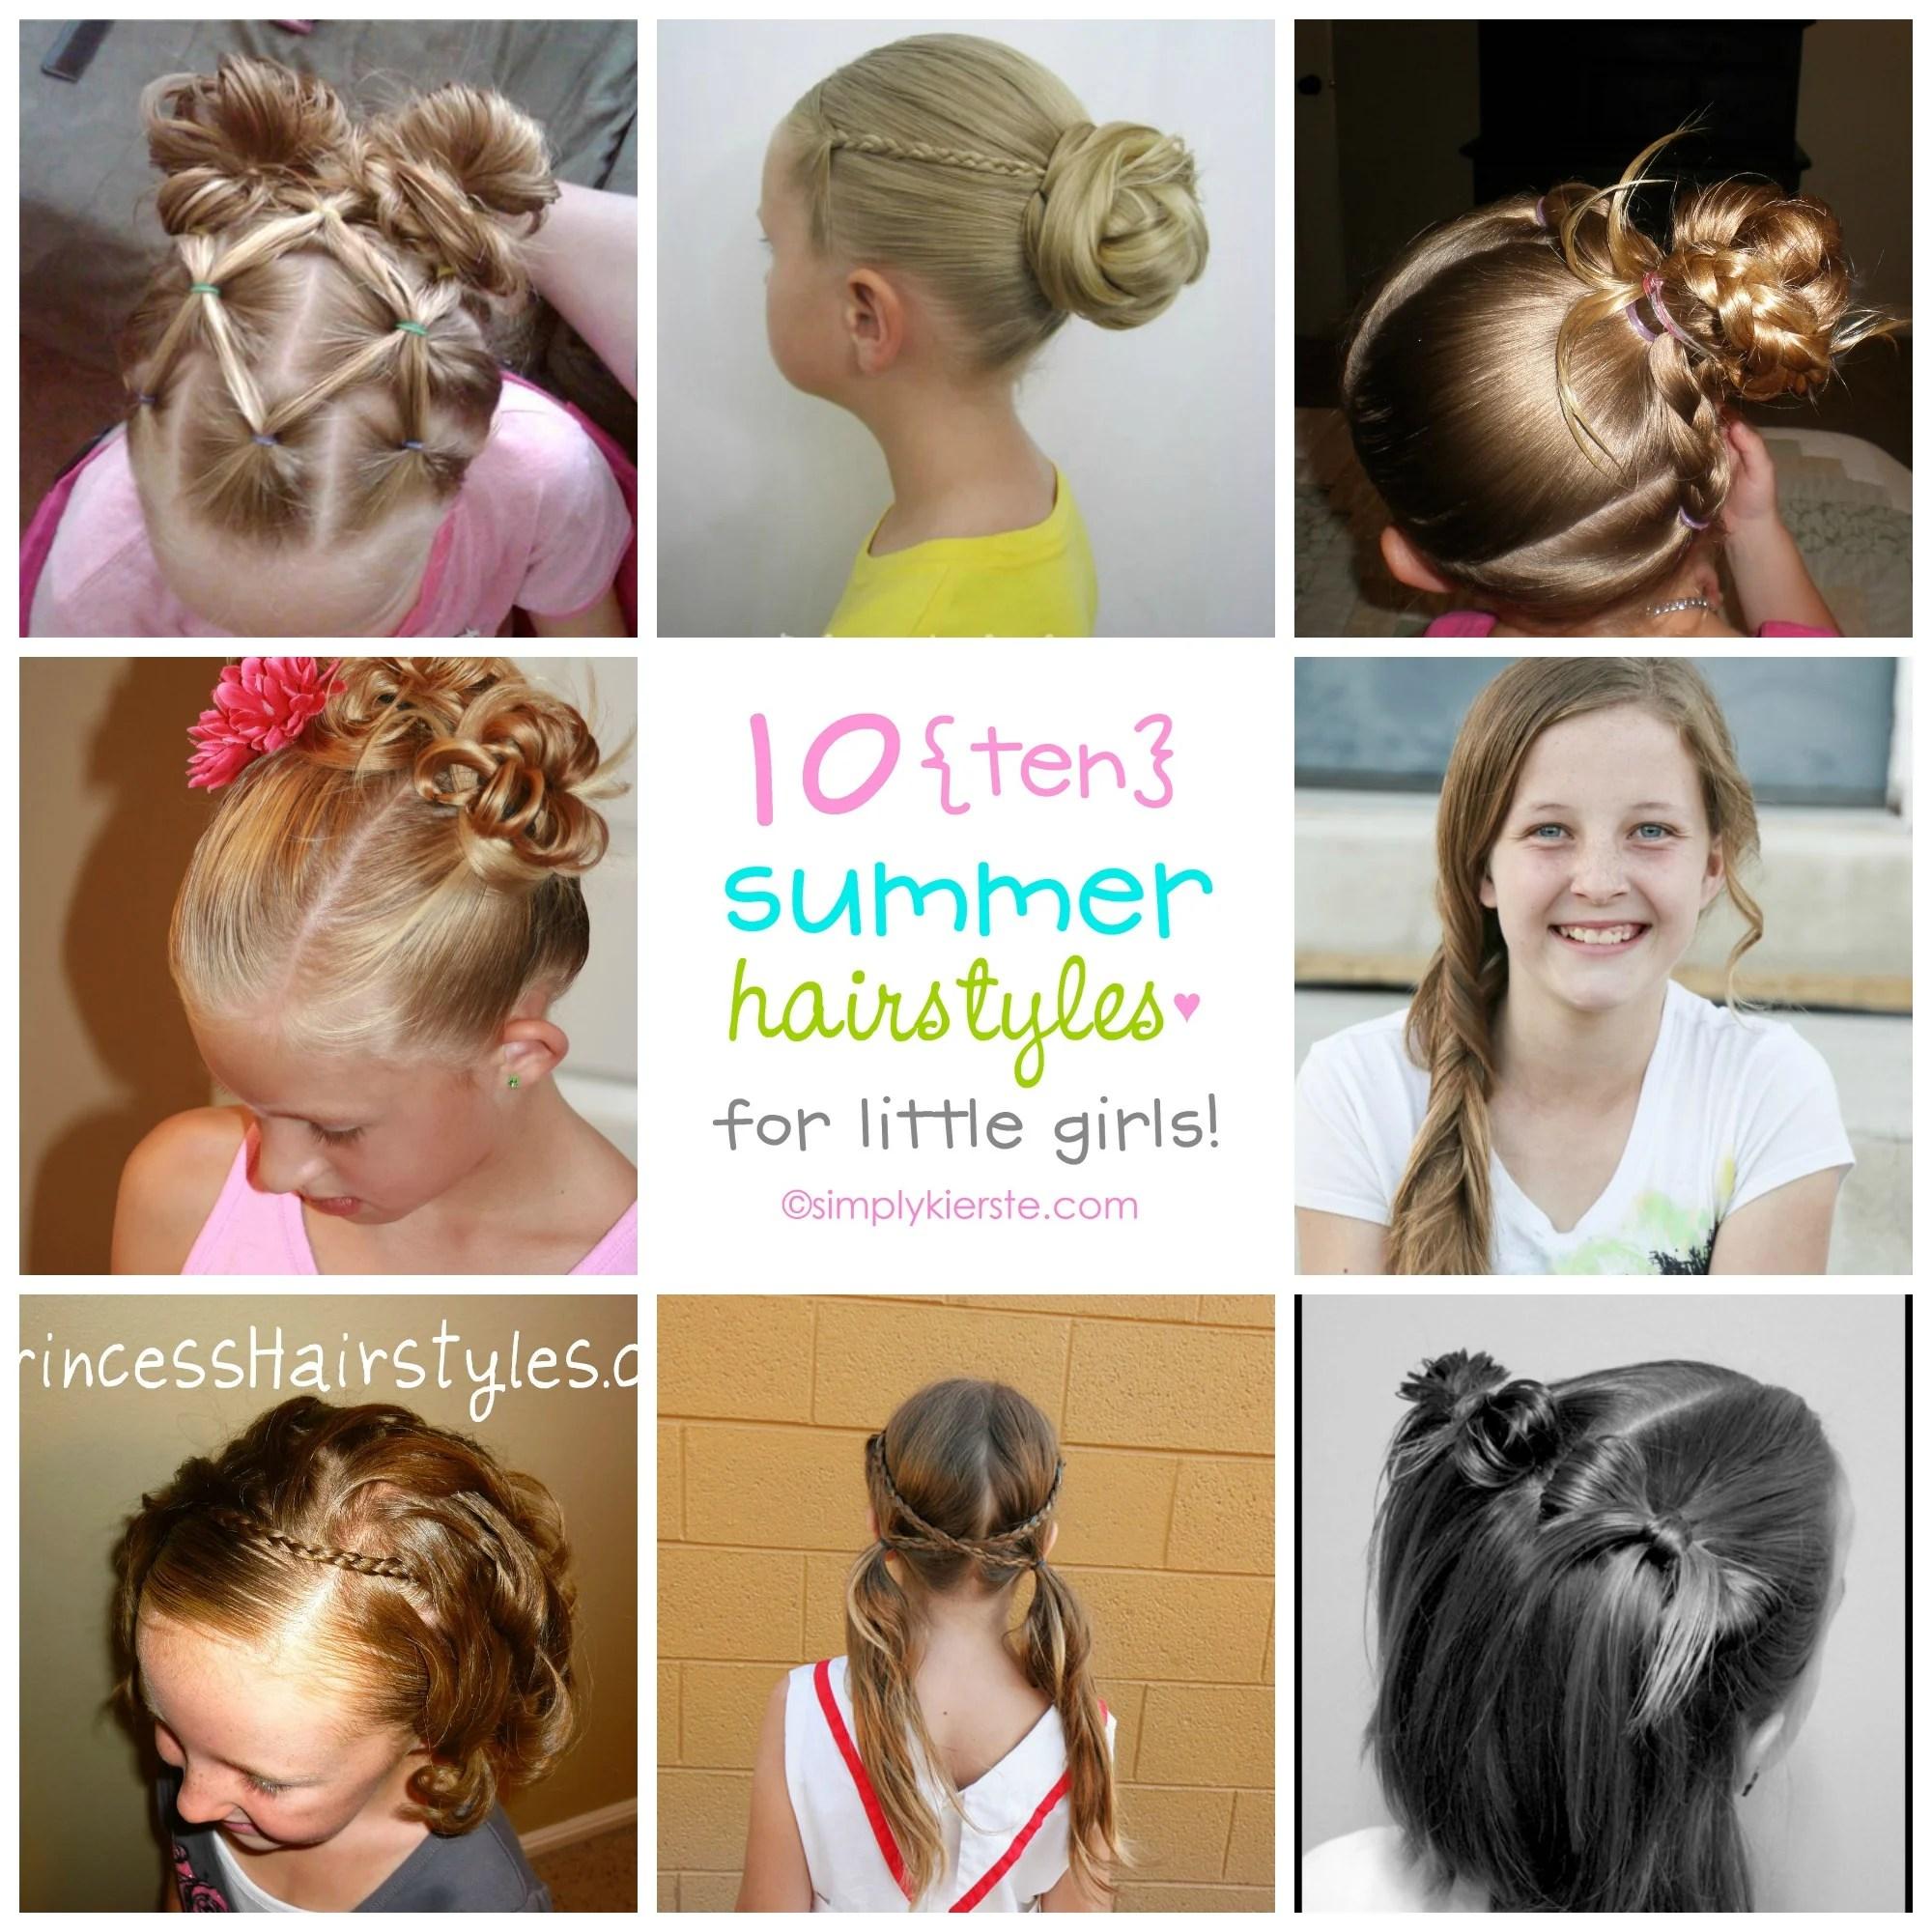 10 Fun Summer Hairstyles for Little Girls